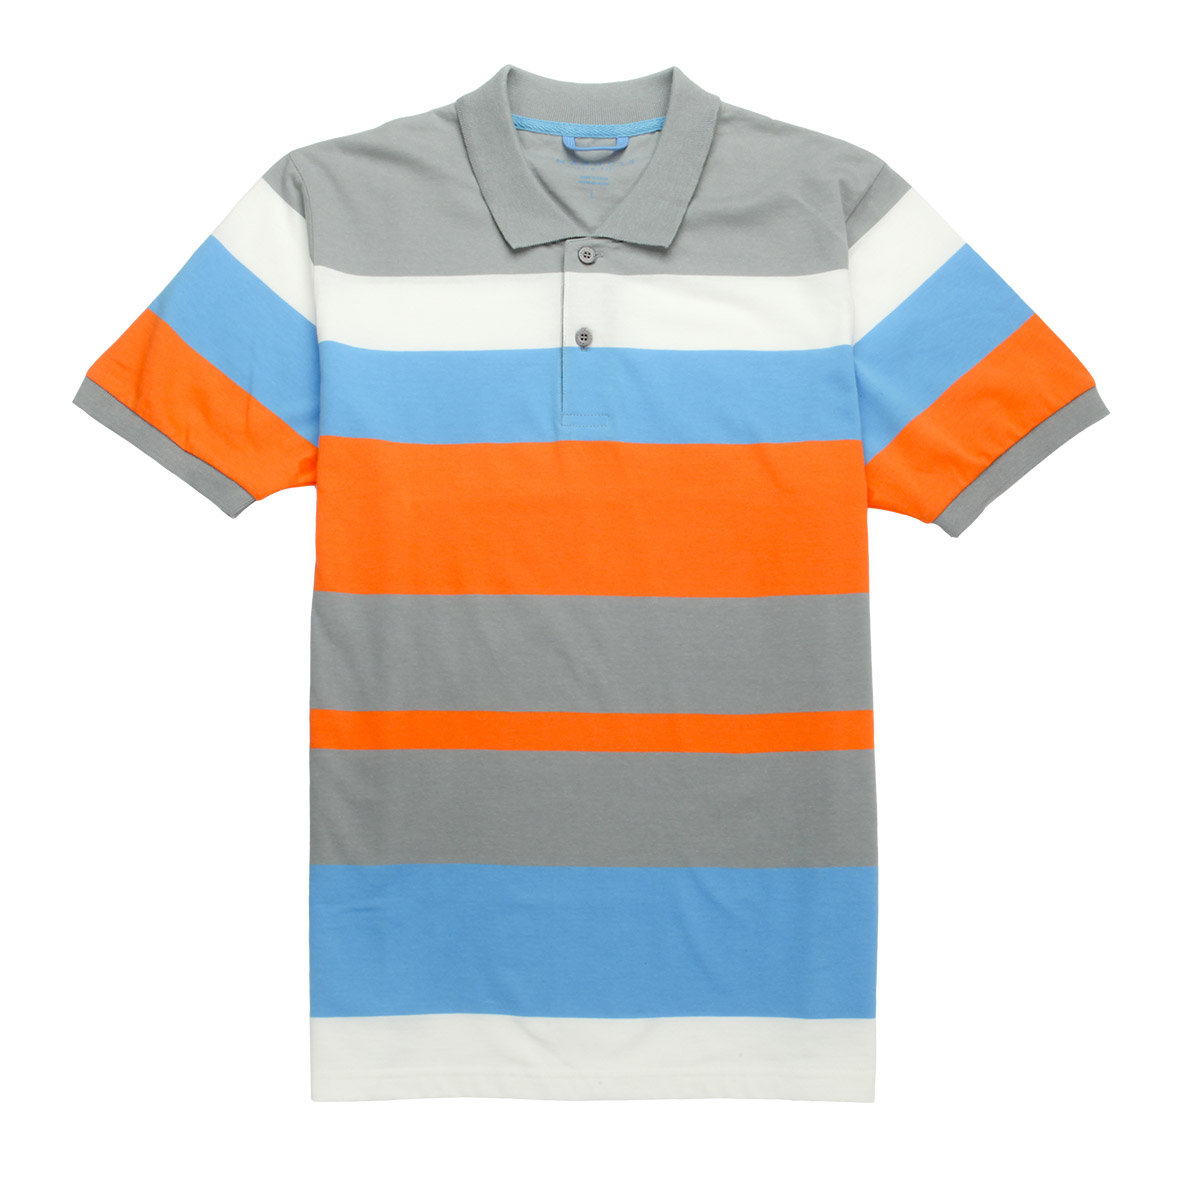 15360 SL - Grey